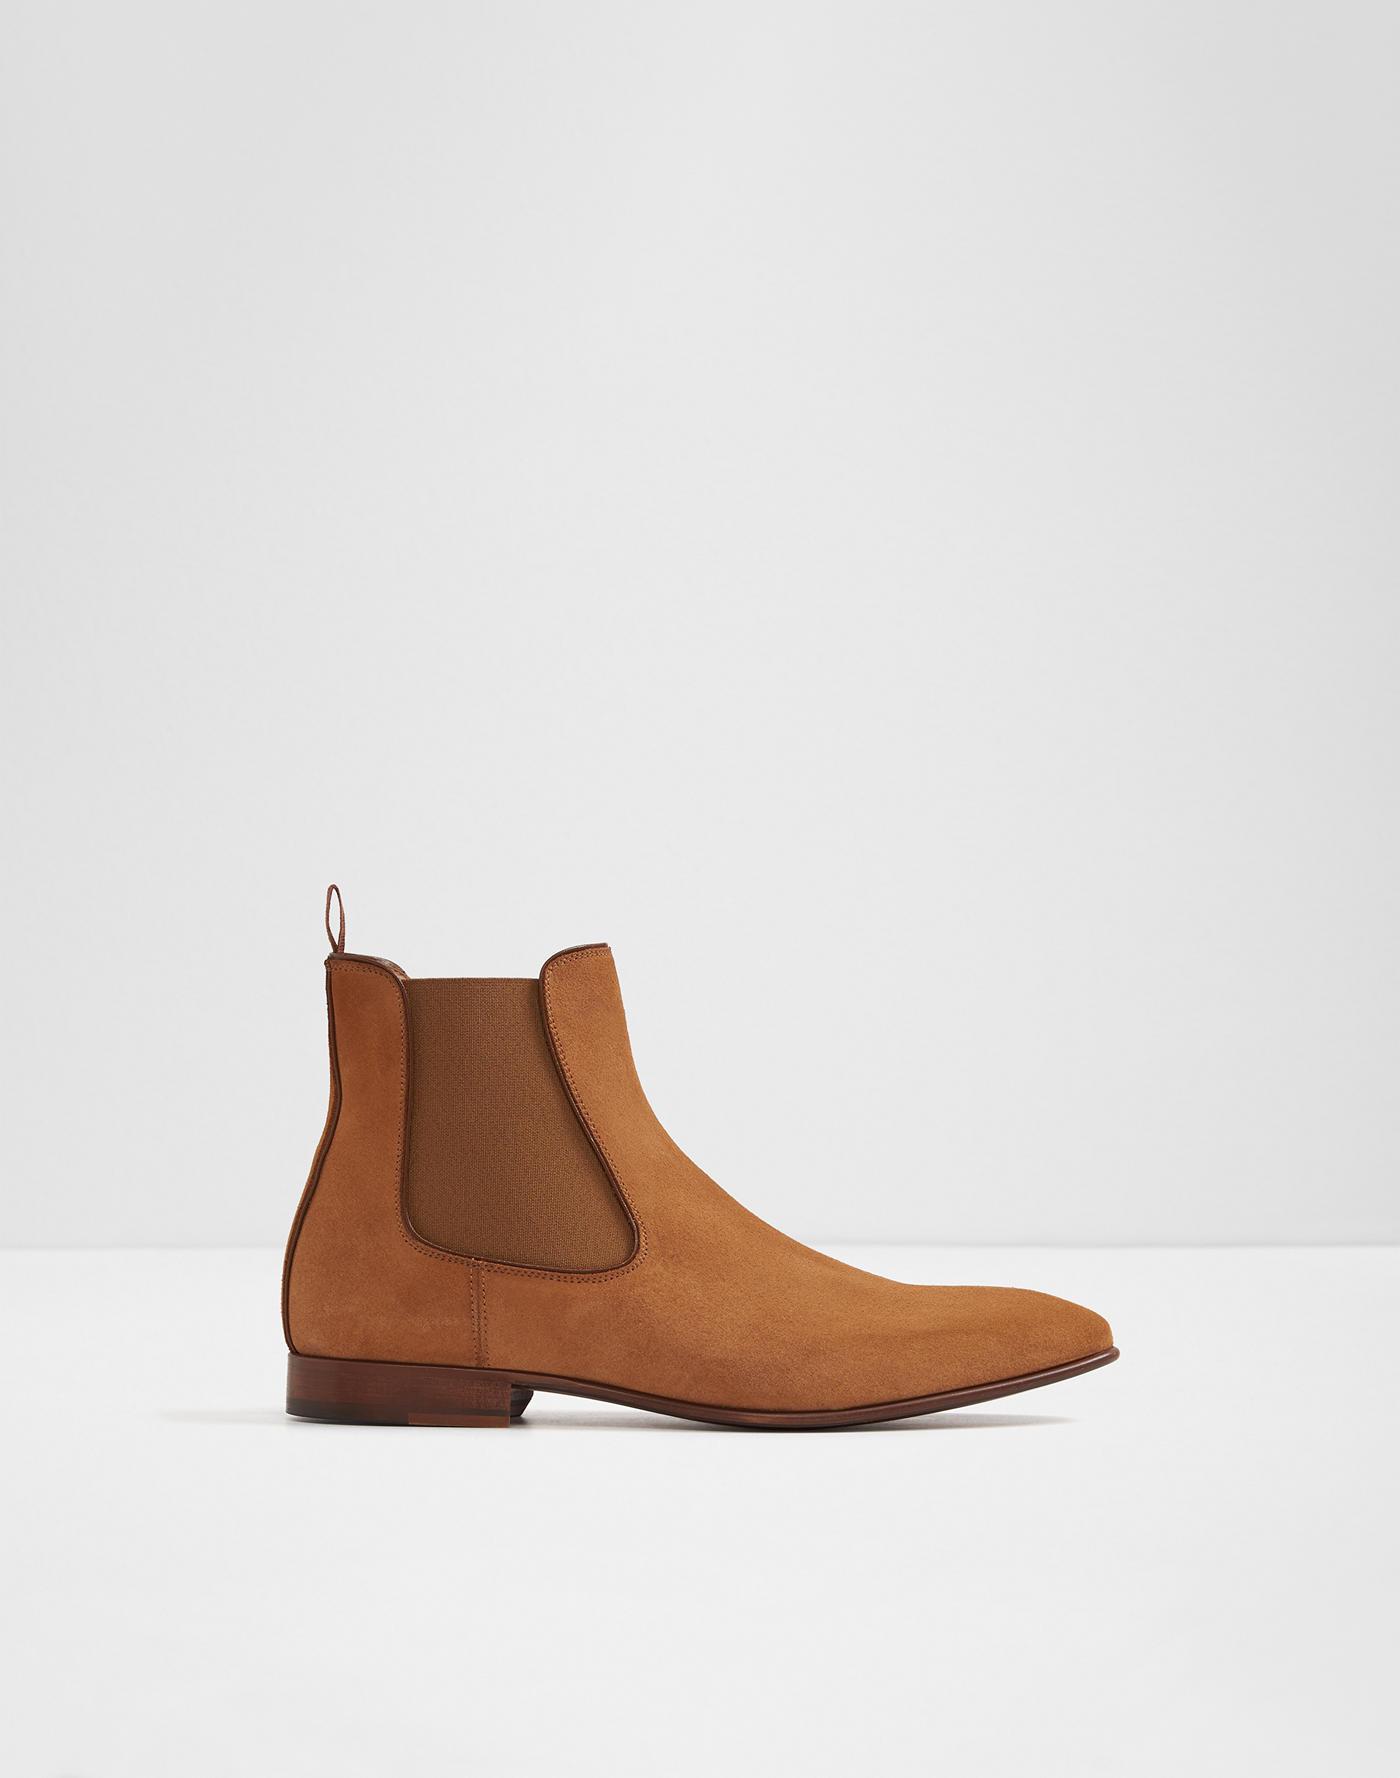 aldo shoes 97405 weather nyc